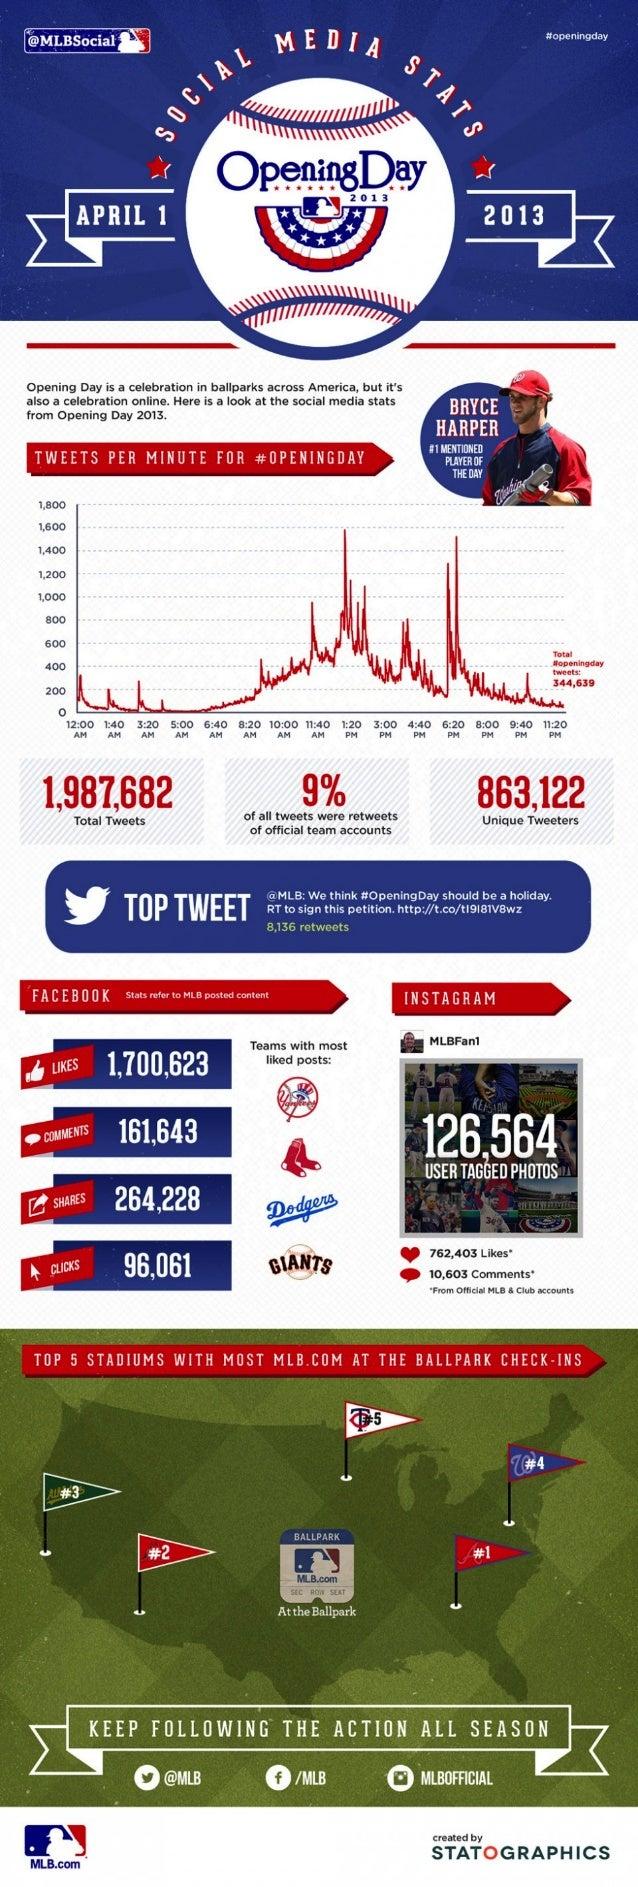 MLB Opening Day 2013 Social Stats